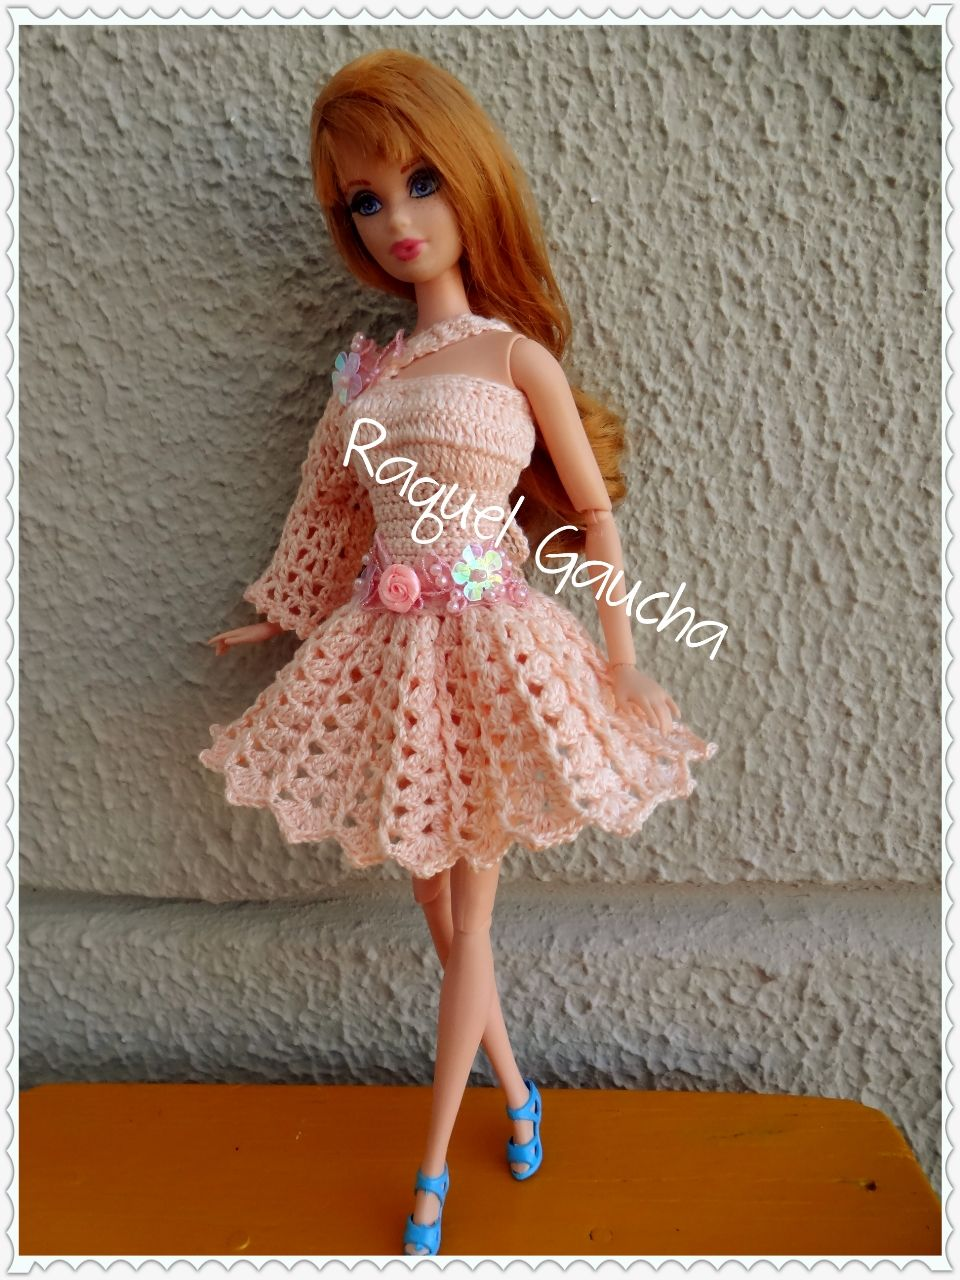 #Cléa5 #Crochet #Barbie #Doll #Muñeca #Midge #Vestido rachelcrochet.wordpress.com #RaquelGaucha